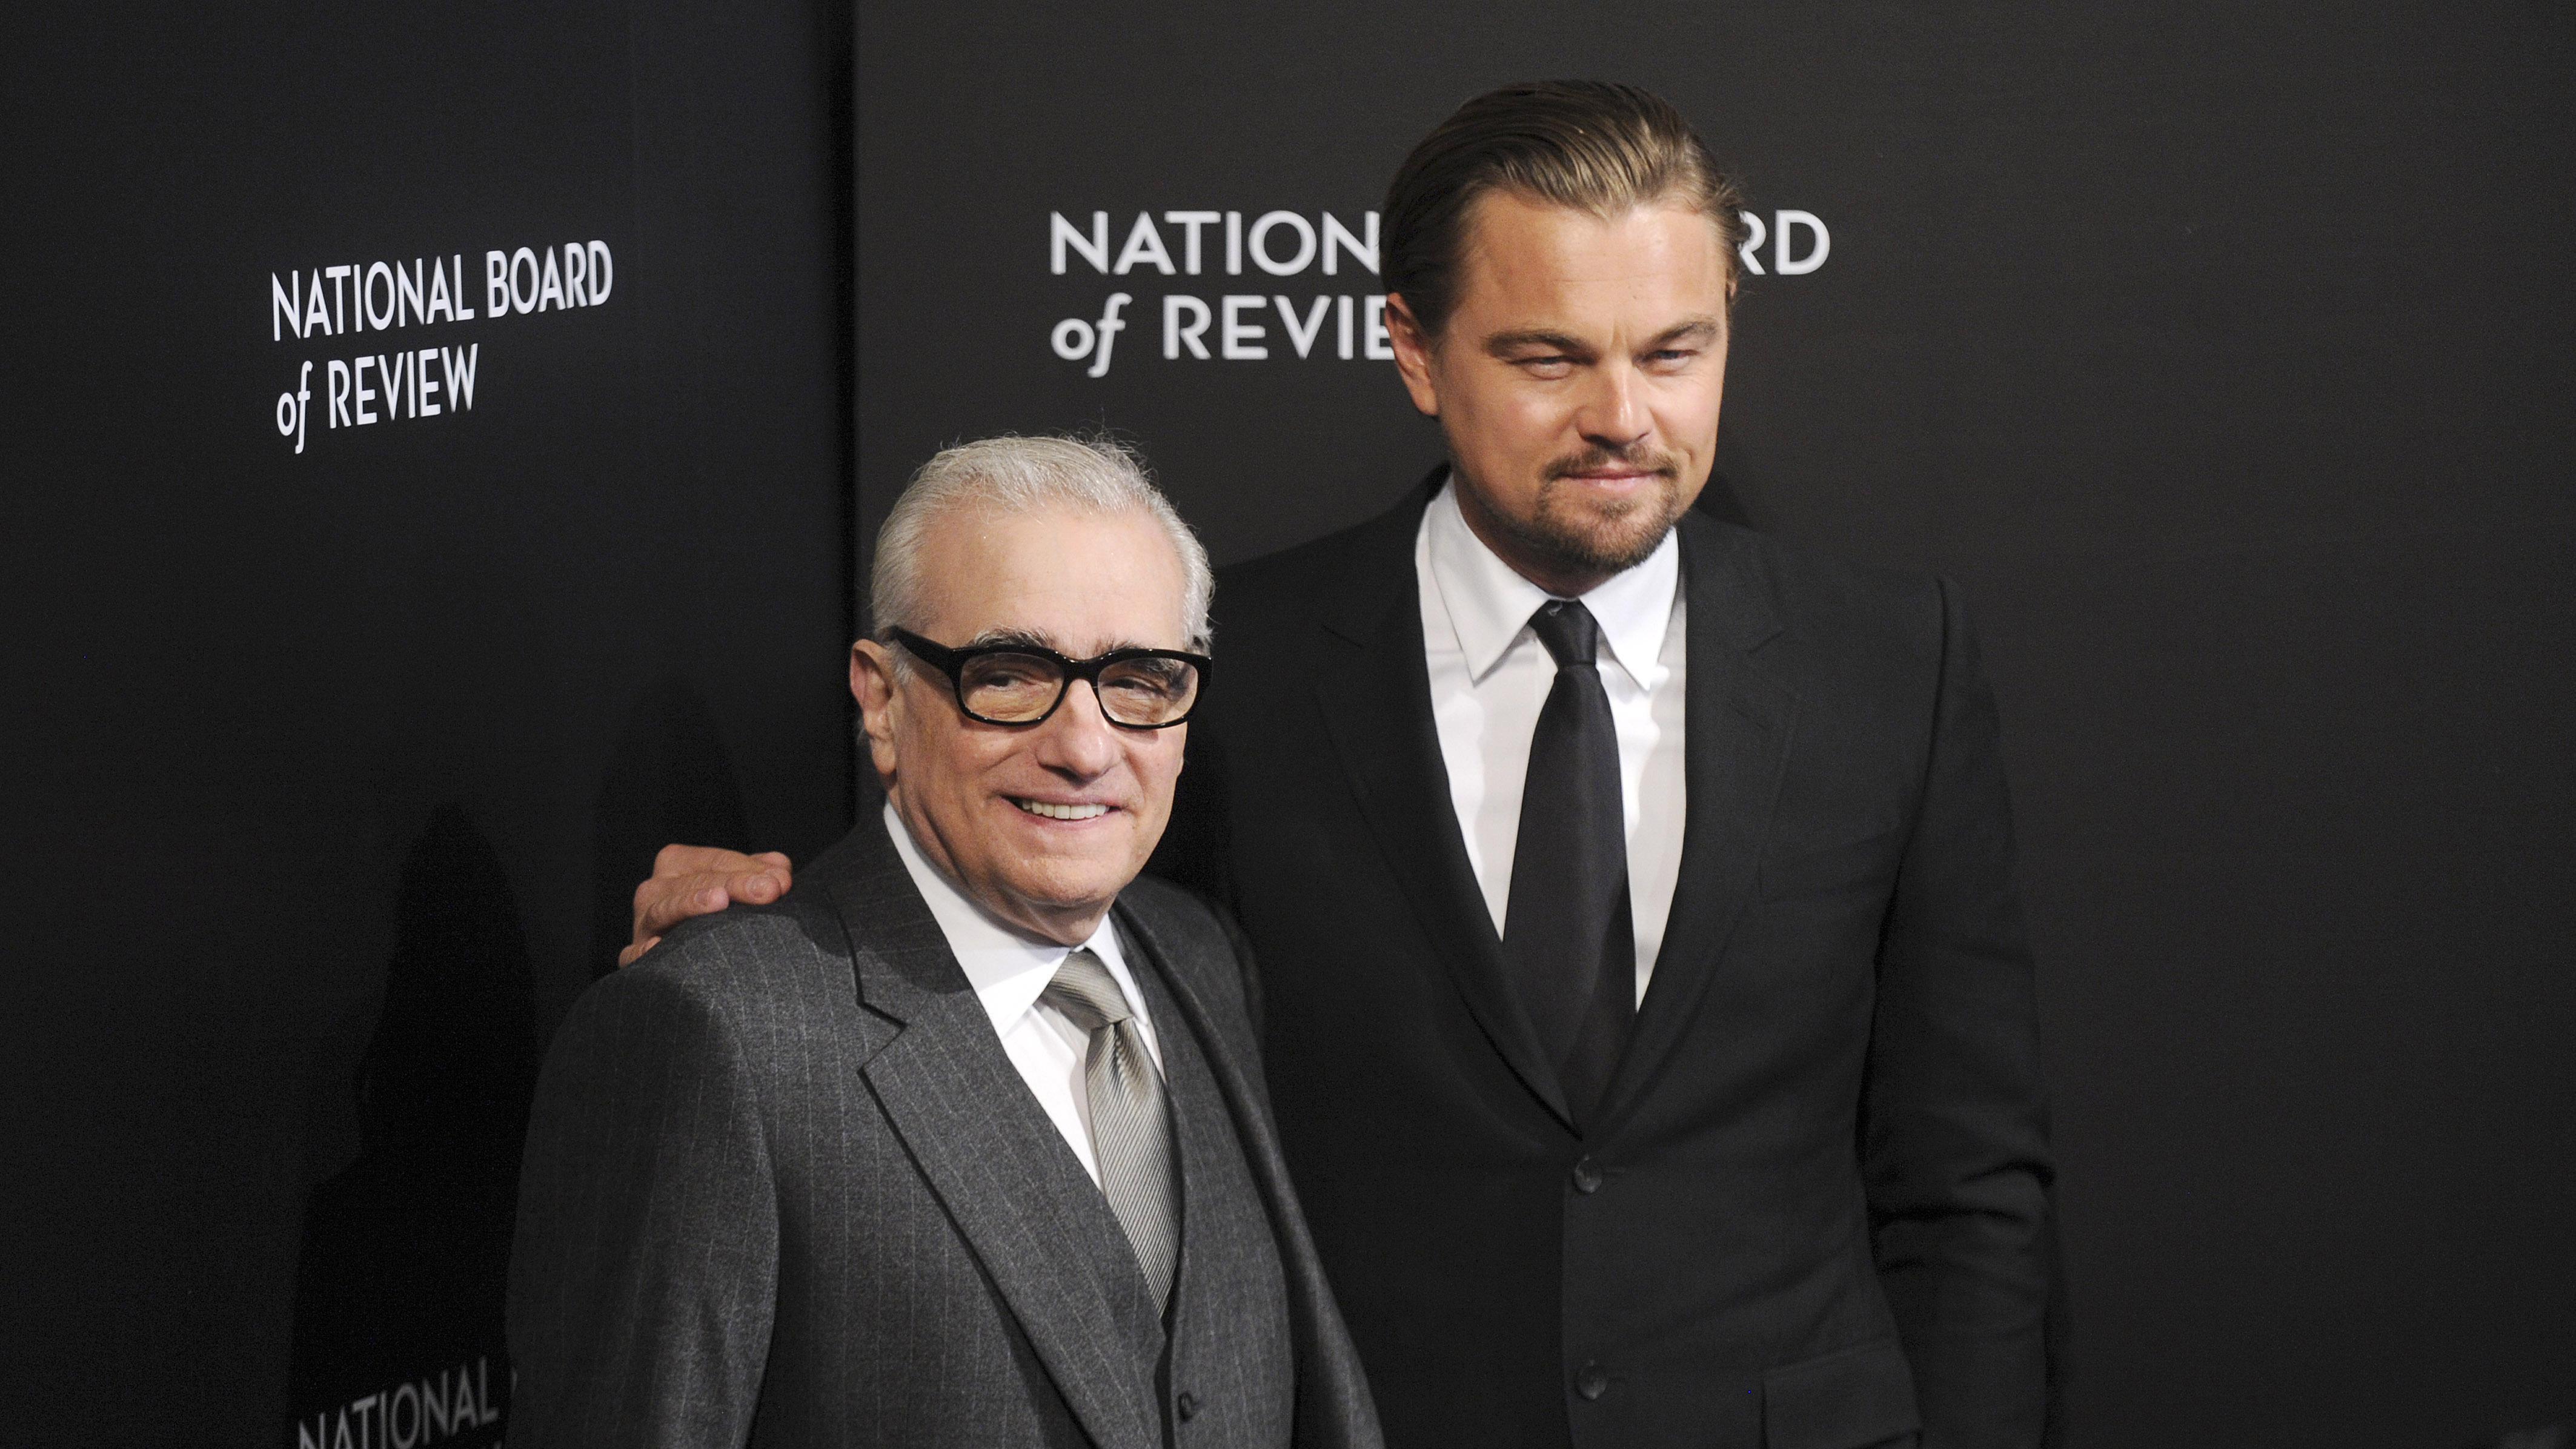 HBO is bringing box-office hit <em>Shutter Island</em> to TV